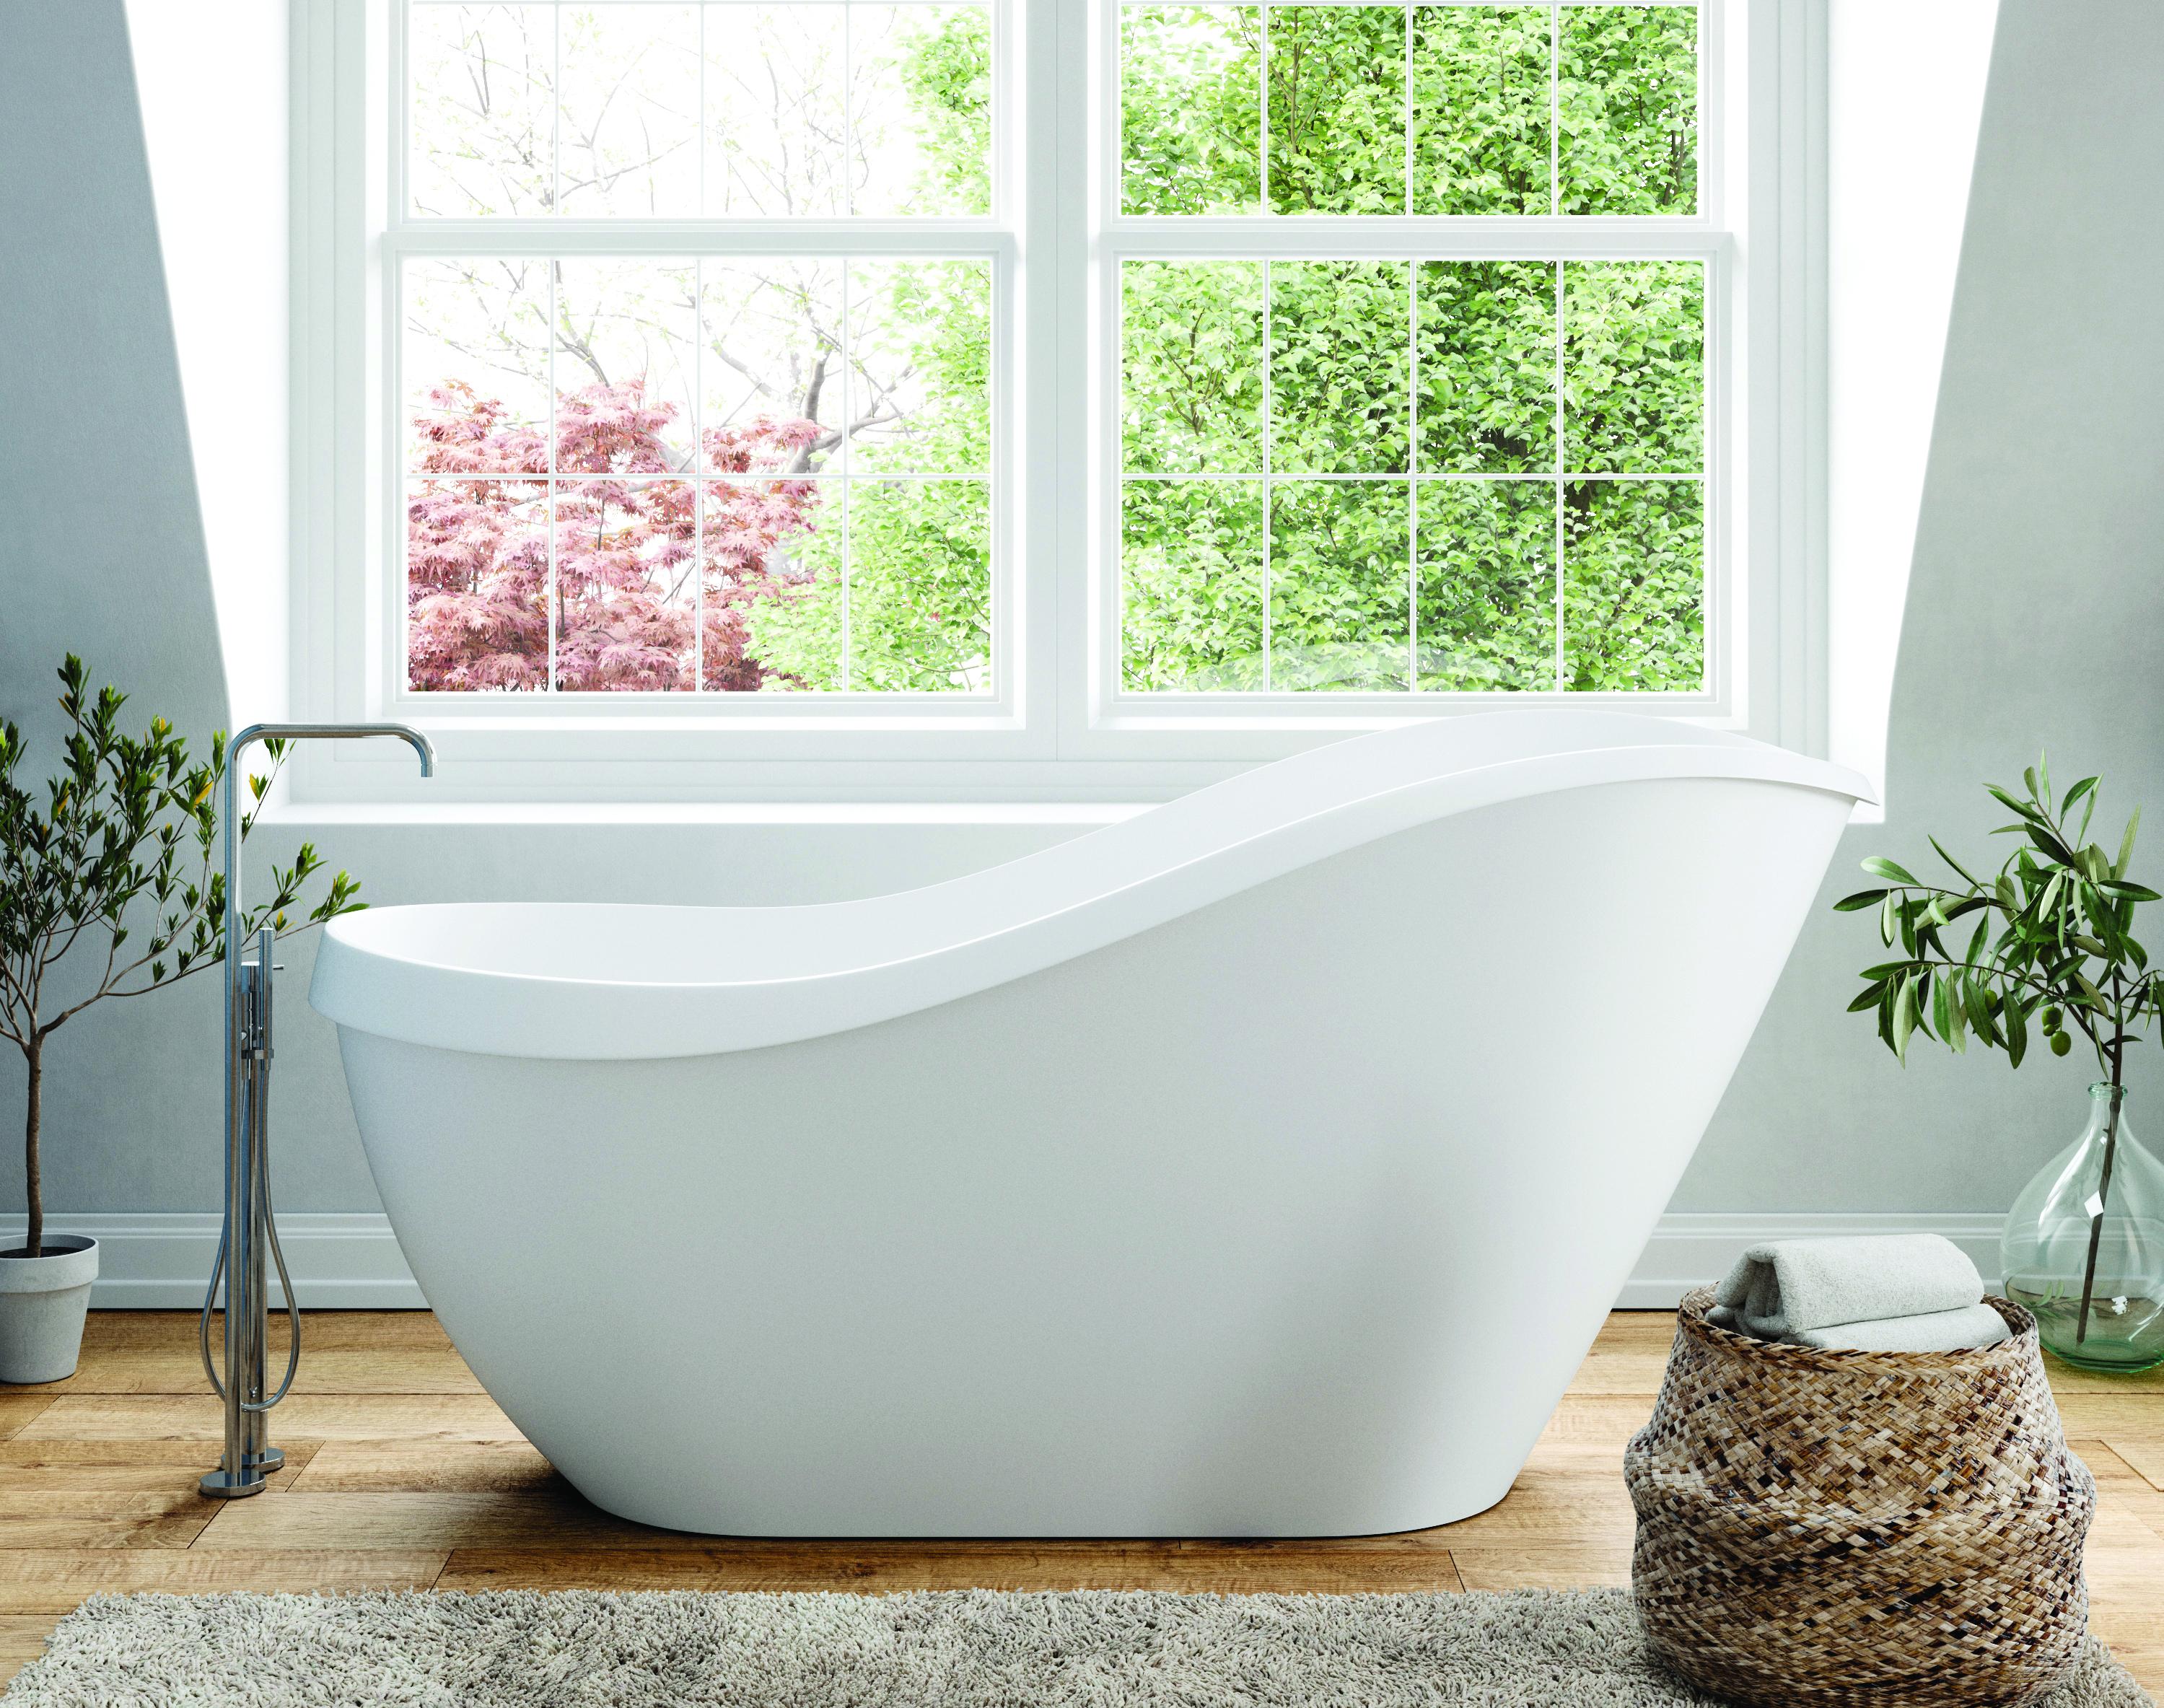 TW0721_Acquabella-Serena-bathtub.jpg